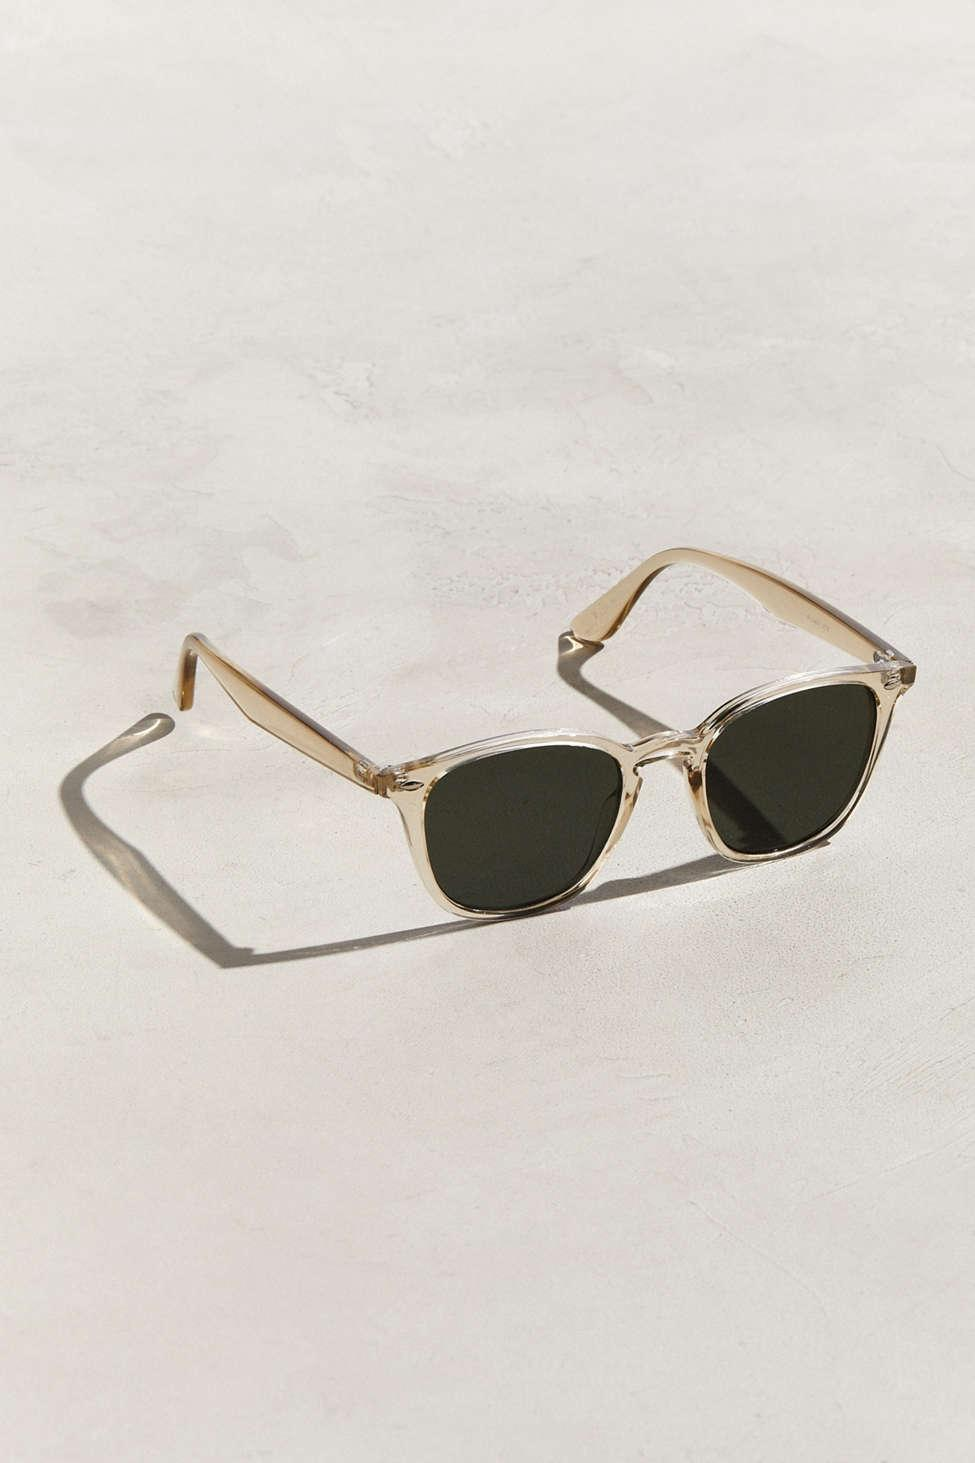 87ffc51b4ad Men s Yellow Crystal Preppy Plastic Square Sunglasses